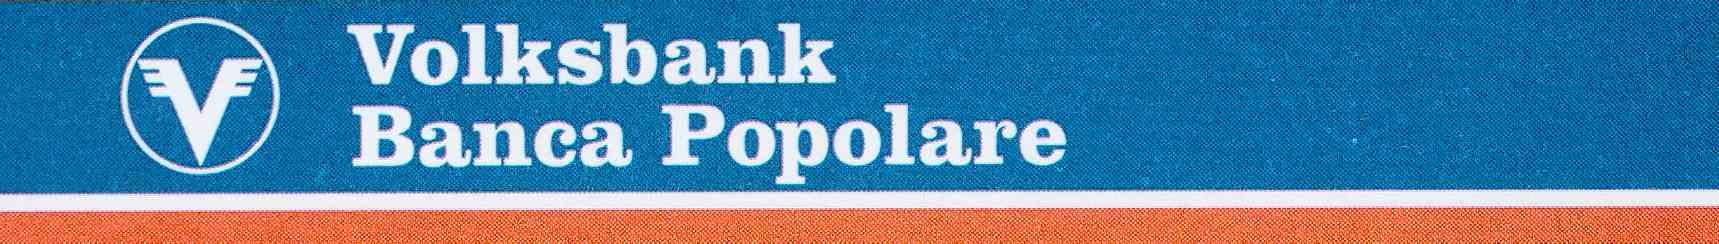 VOLKSBANK SENIOR DAY (13:00 - 14:00) Volksbank Logo